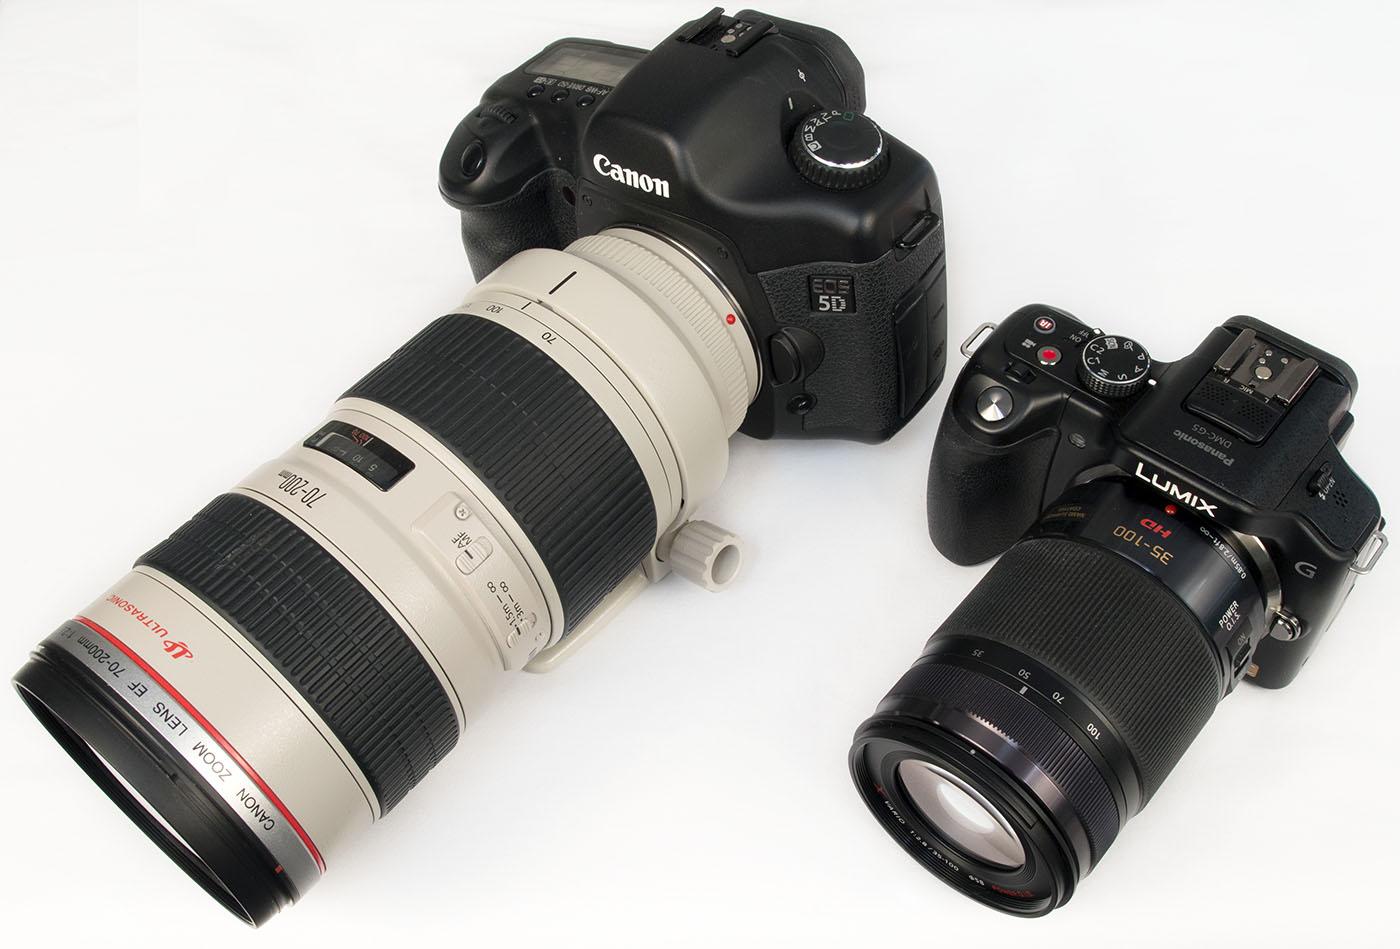 Review Of Panasonic Lumix Gx Vario 35 100mm F 2 8 Lens